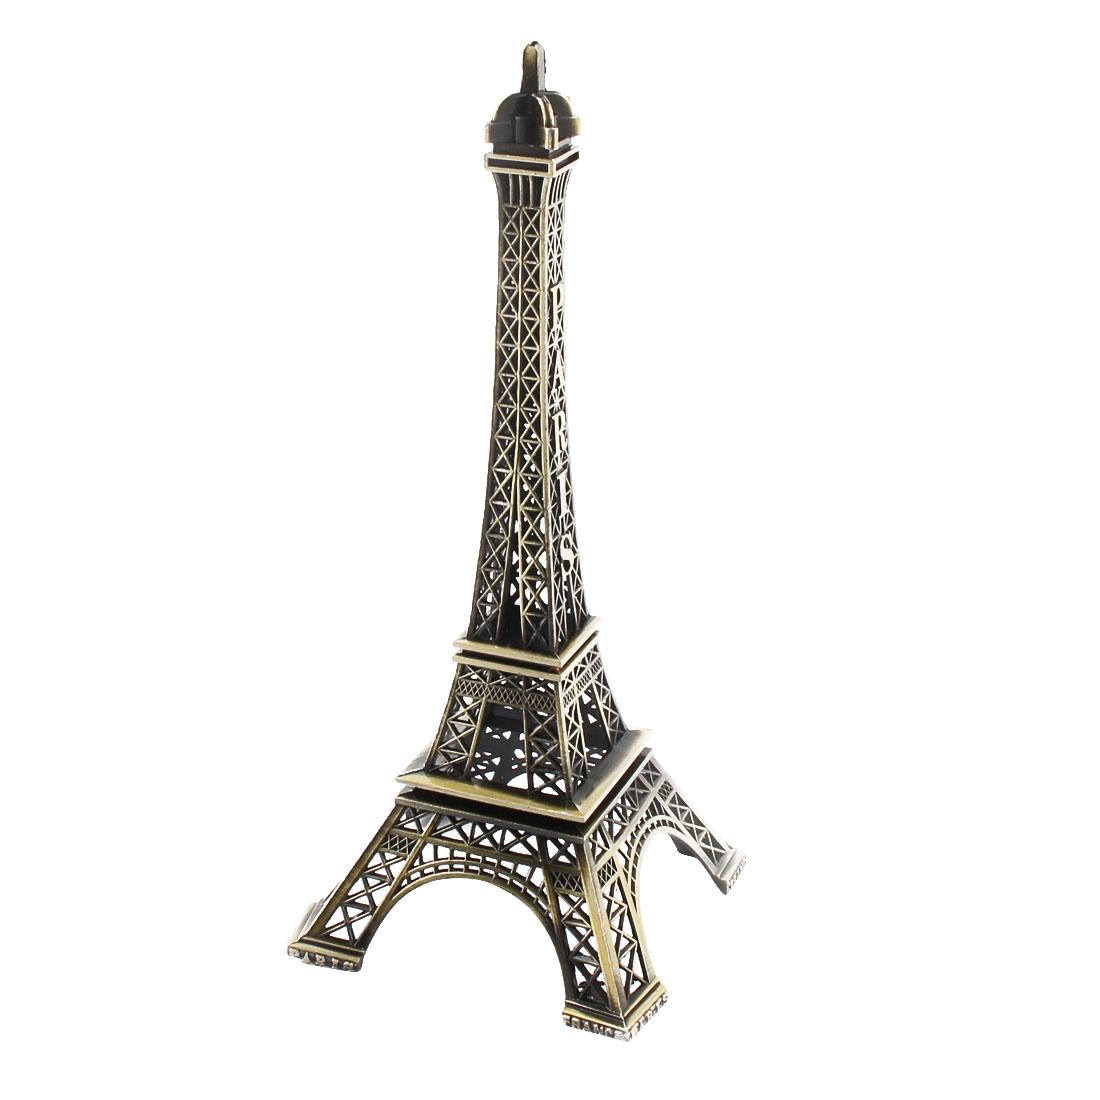 Home Desk Decor Metal Miniature Statue Paris Eiffel Tower Model Bronze Tone